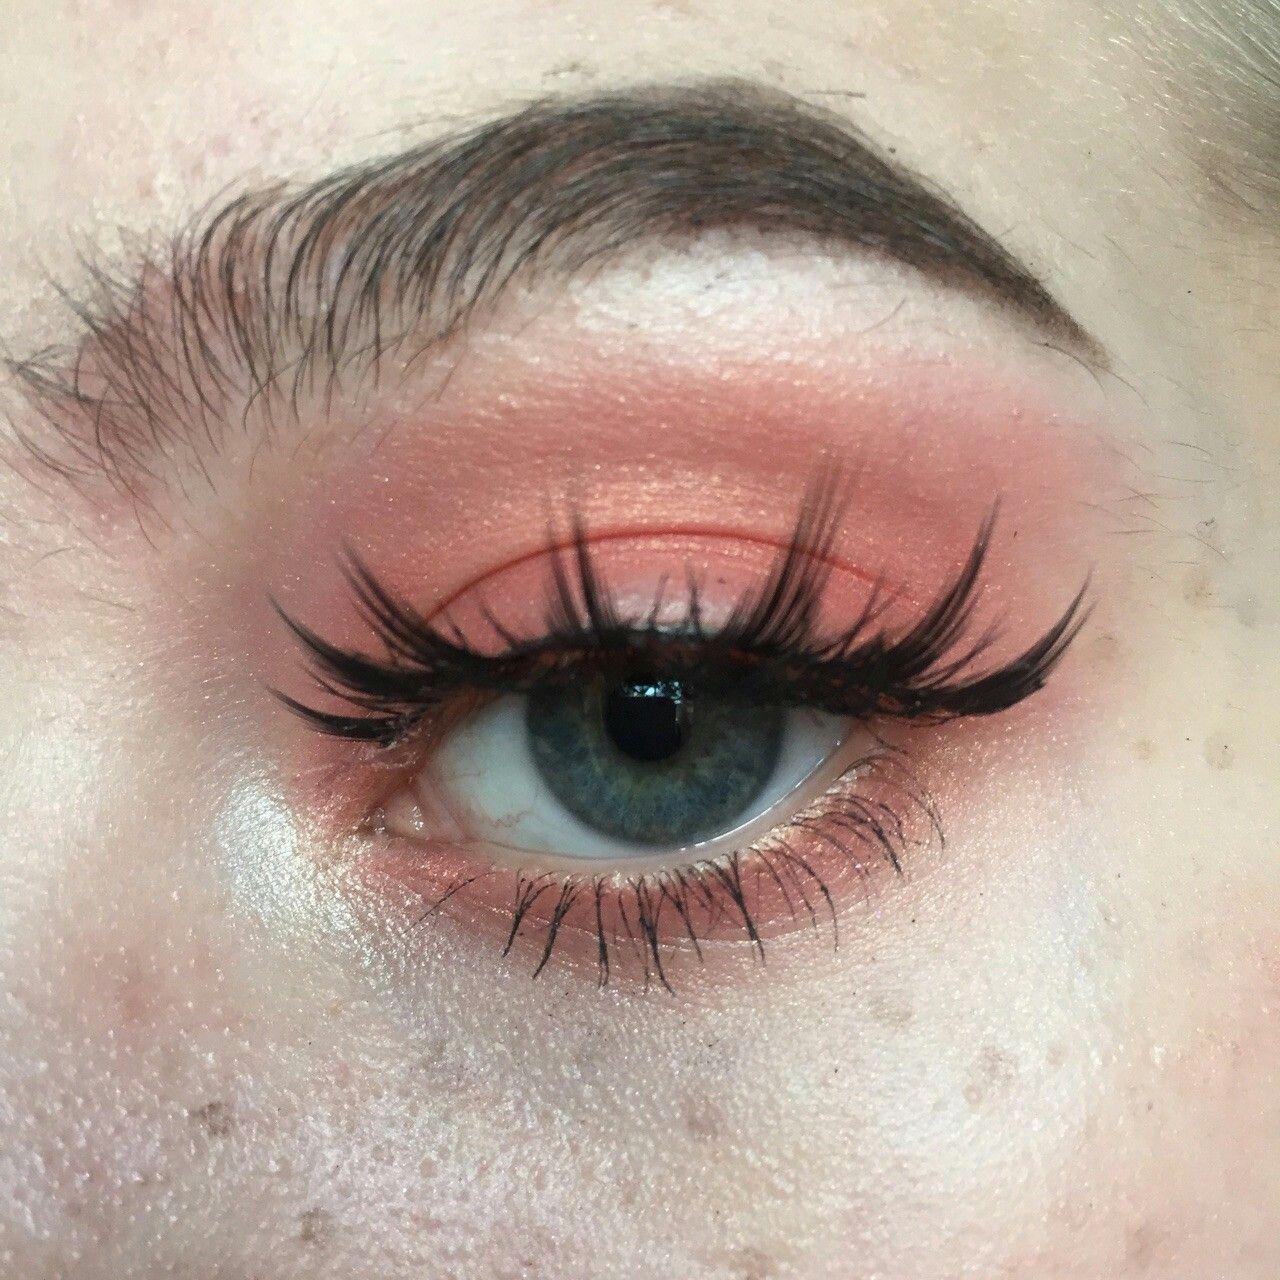 Pin By Octavia On Fantastik Make Up Aesthetic Eyes Aesthetic